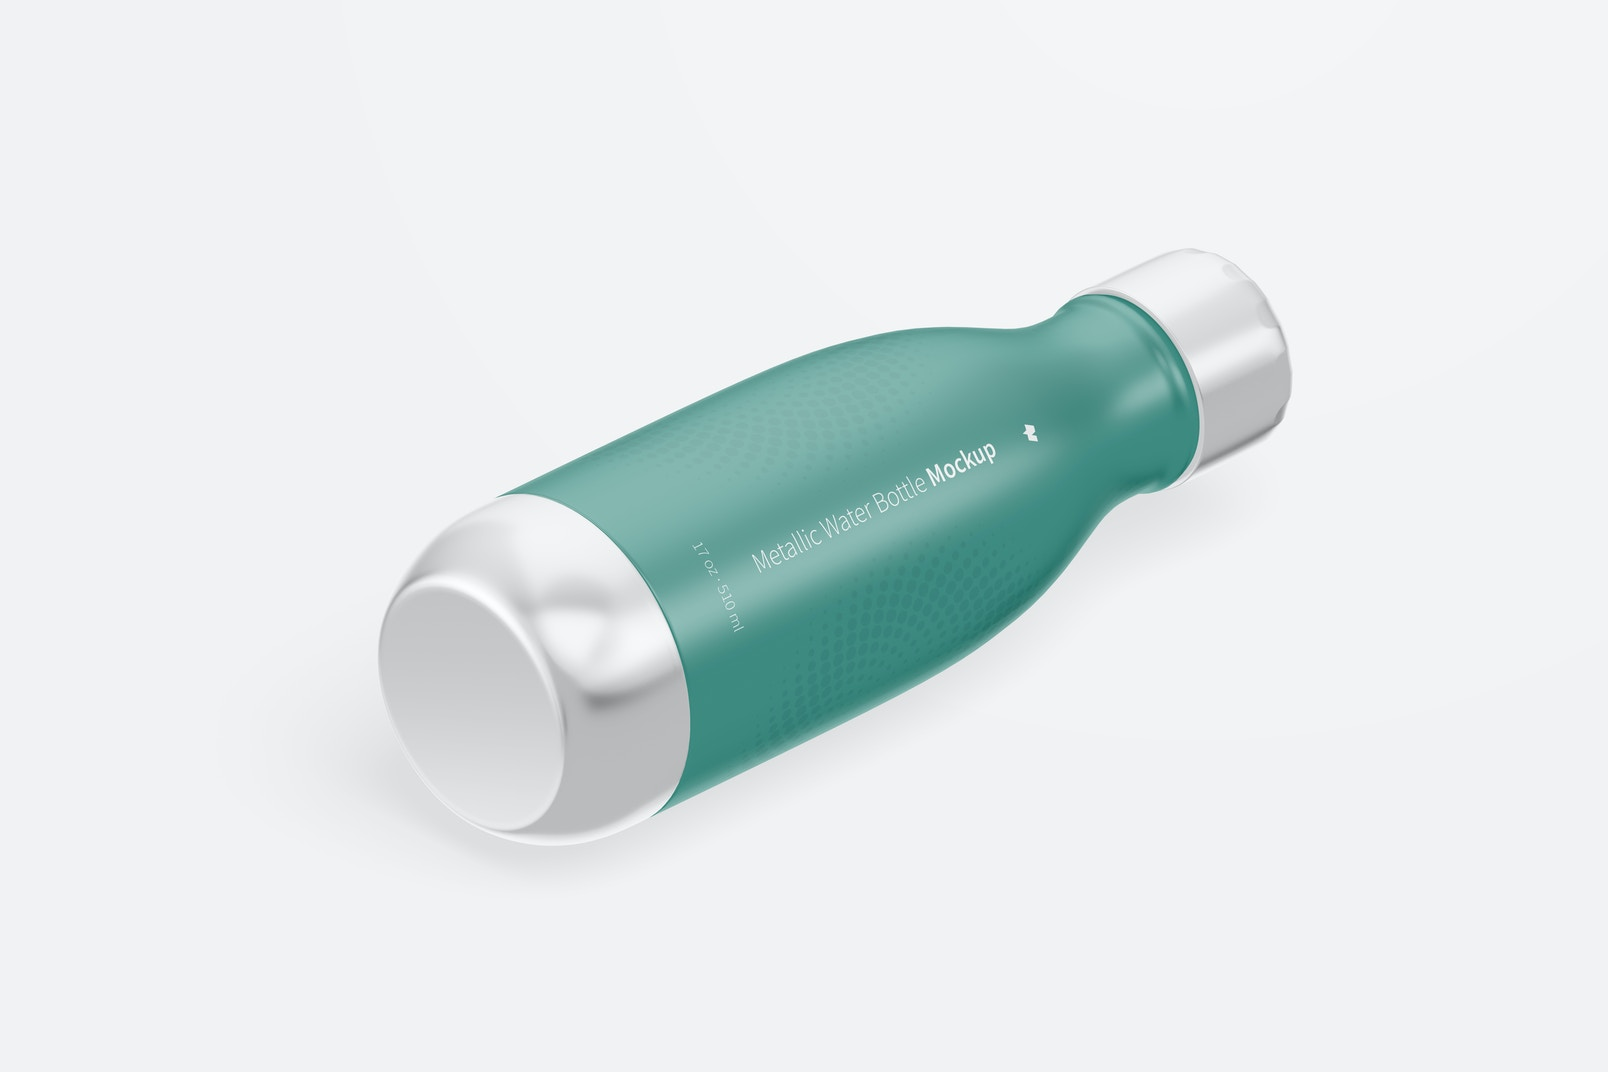 17 oz Metallic Water Bottles Mockup, Isometric Right View